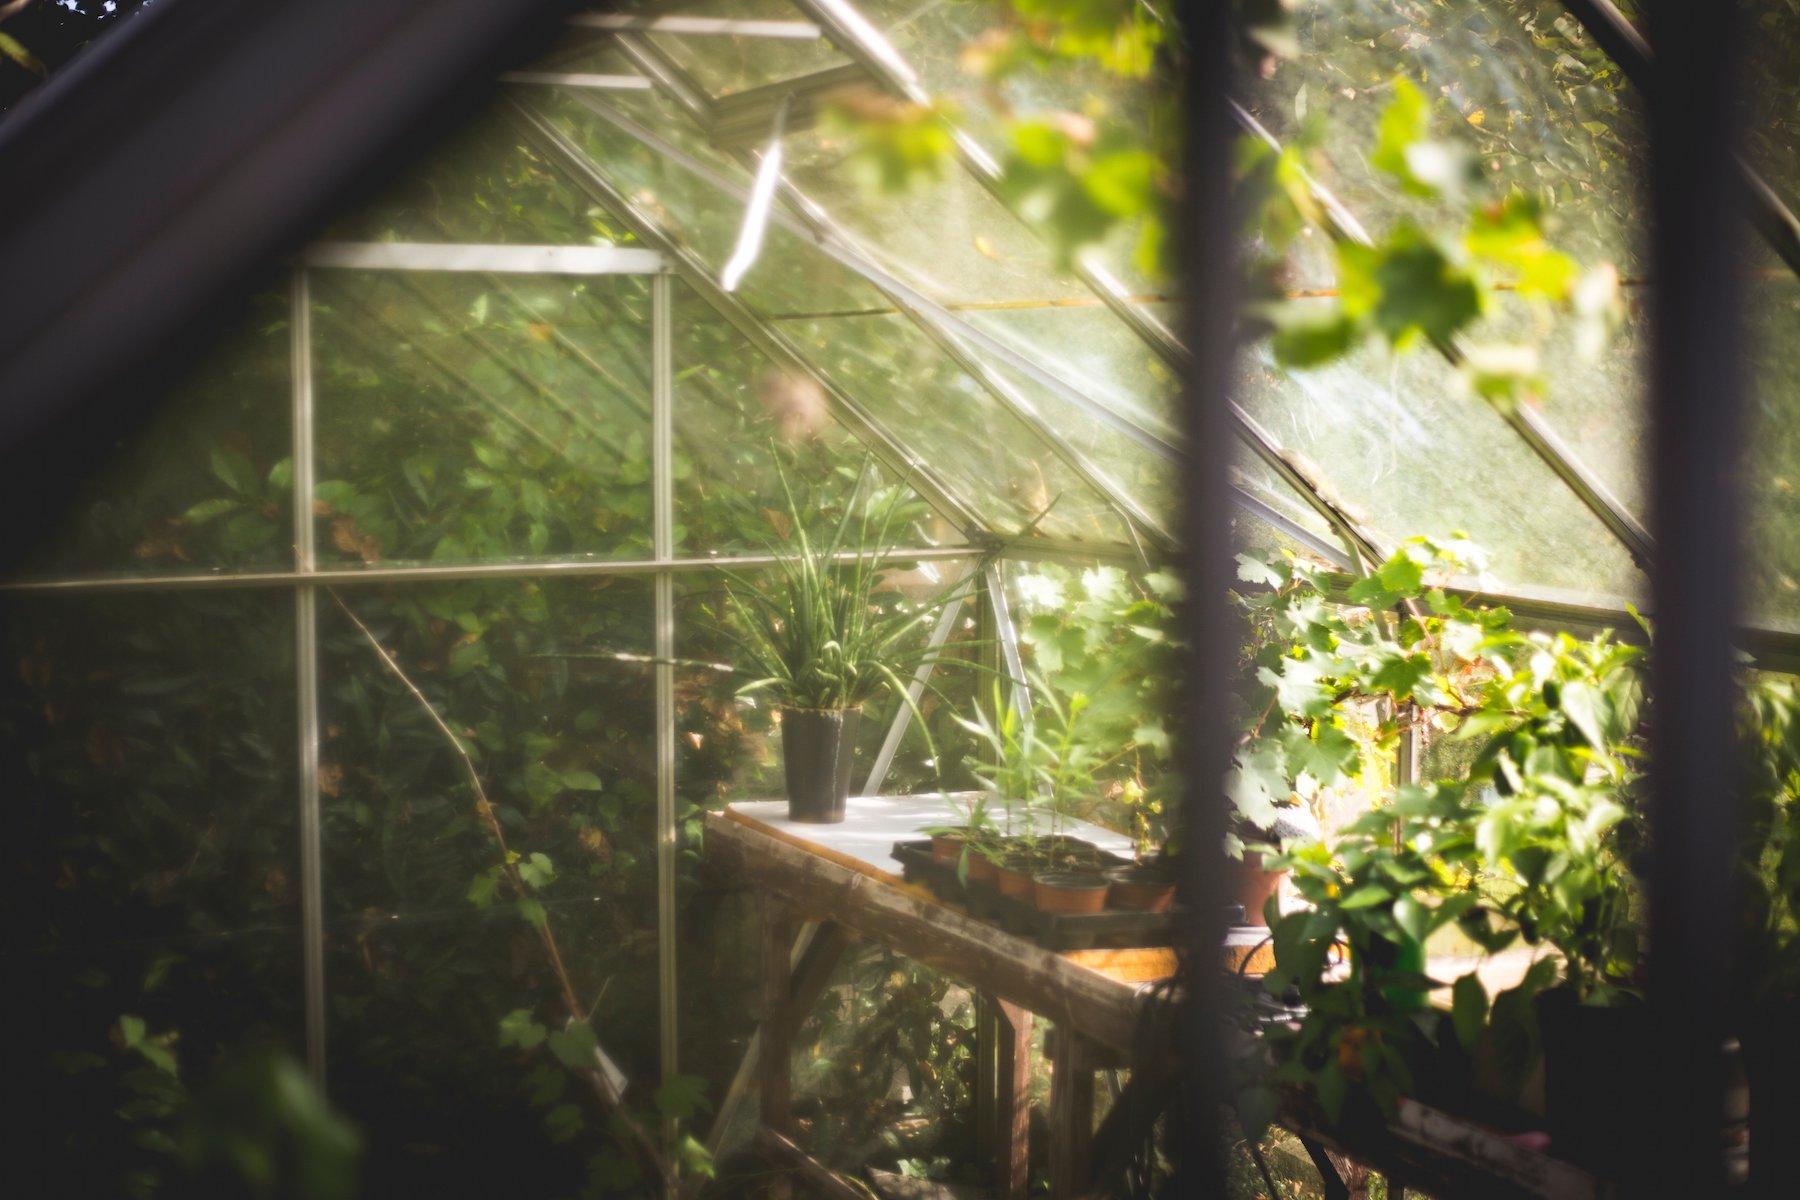 Future Farm buys 10-acre greenhouse in Florida generating $2.8 million in revenue